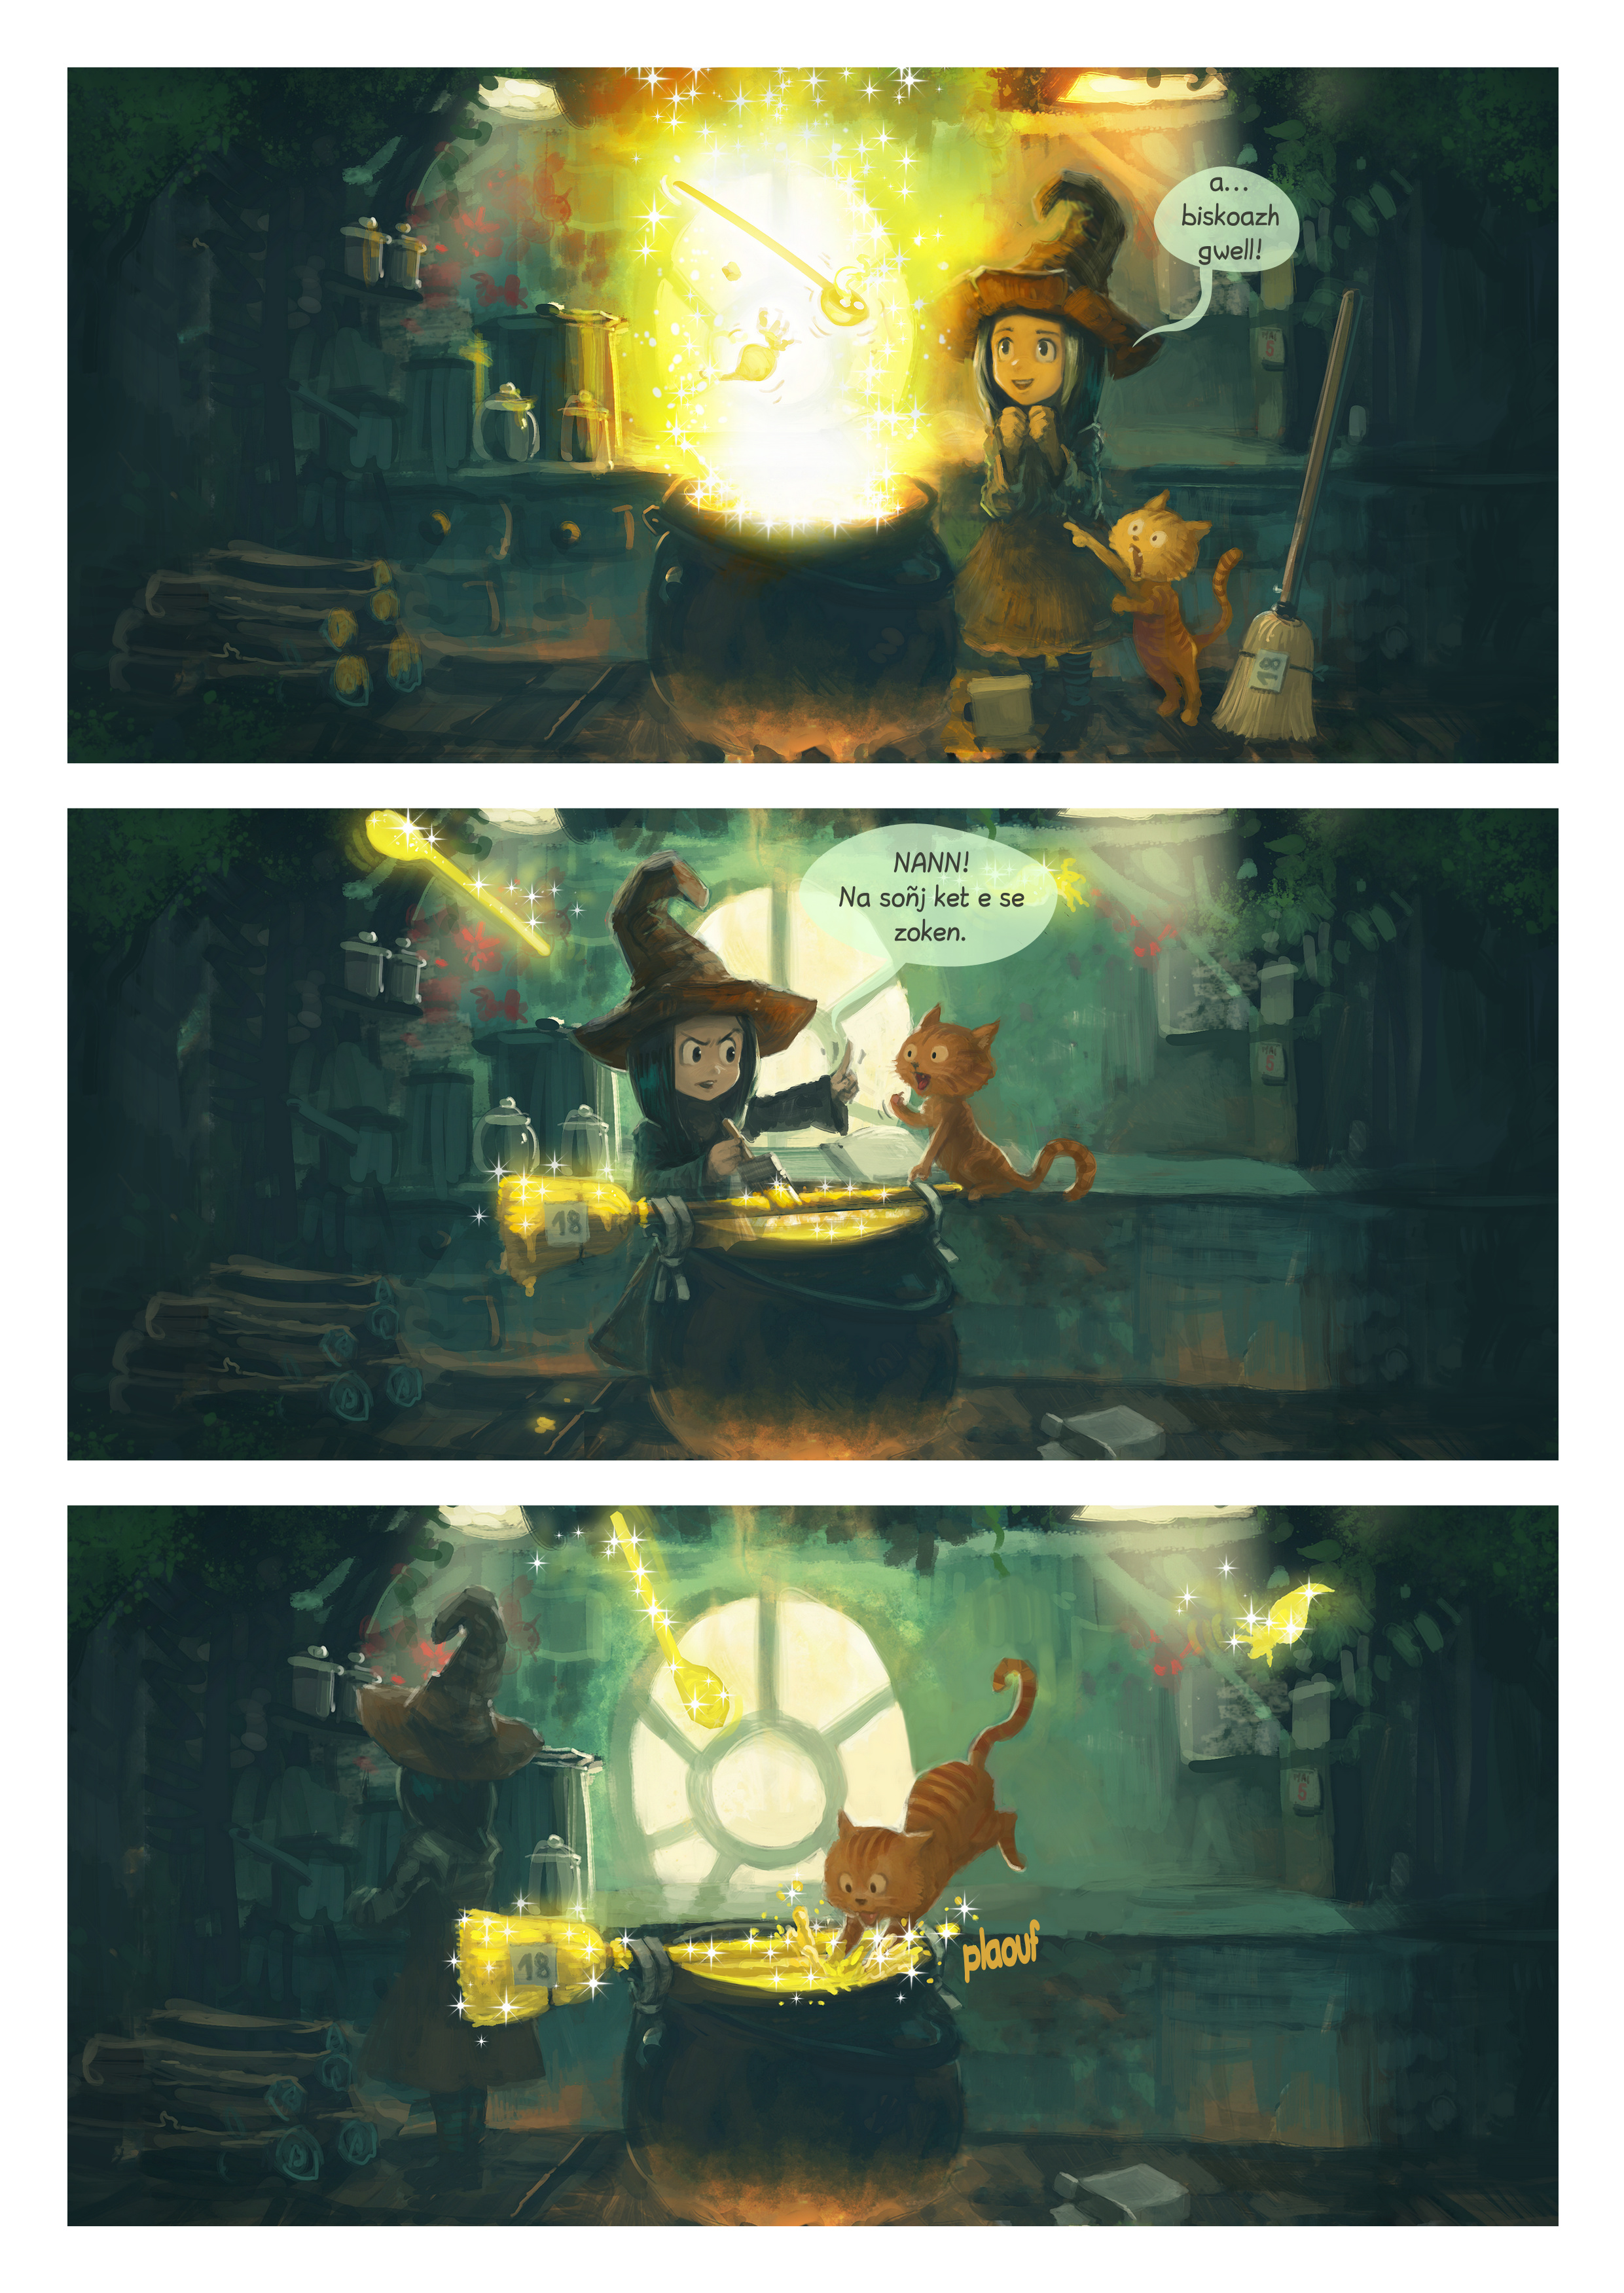 A webcomic page of Pepper&Carrot, rann 1 [br], pajenn 2